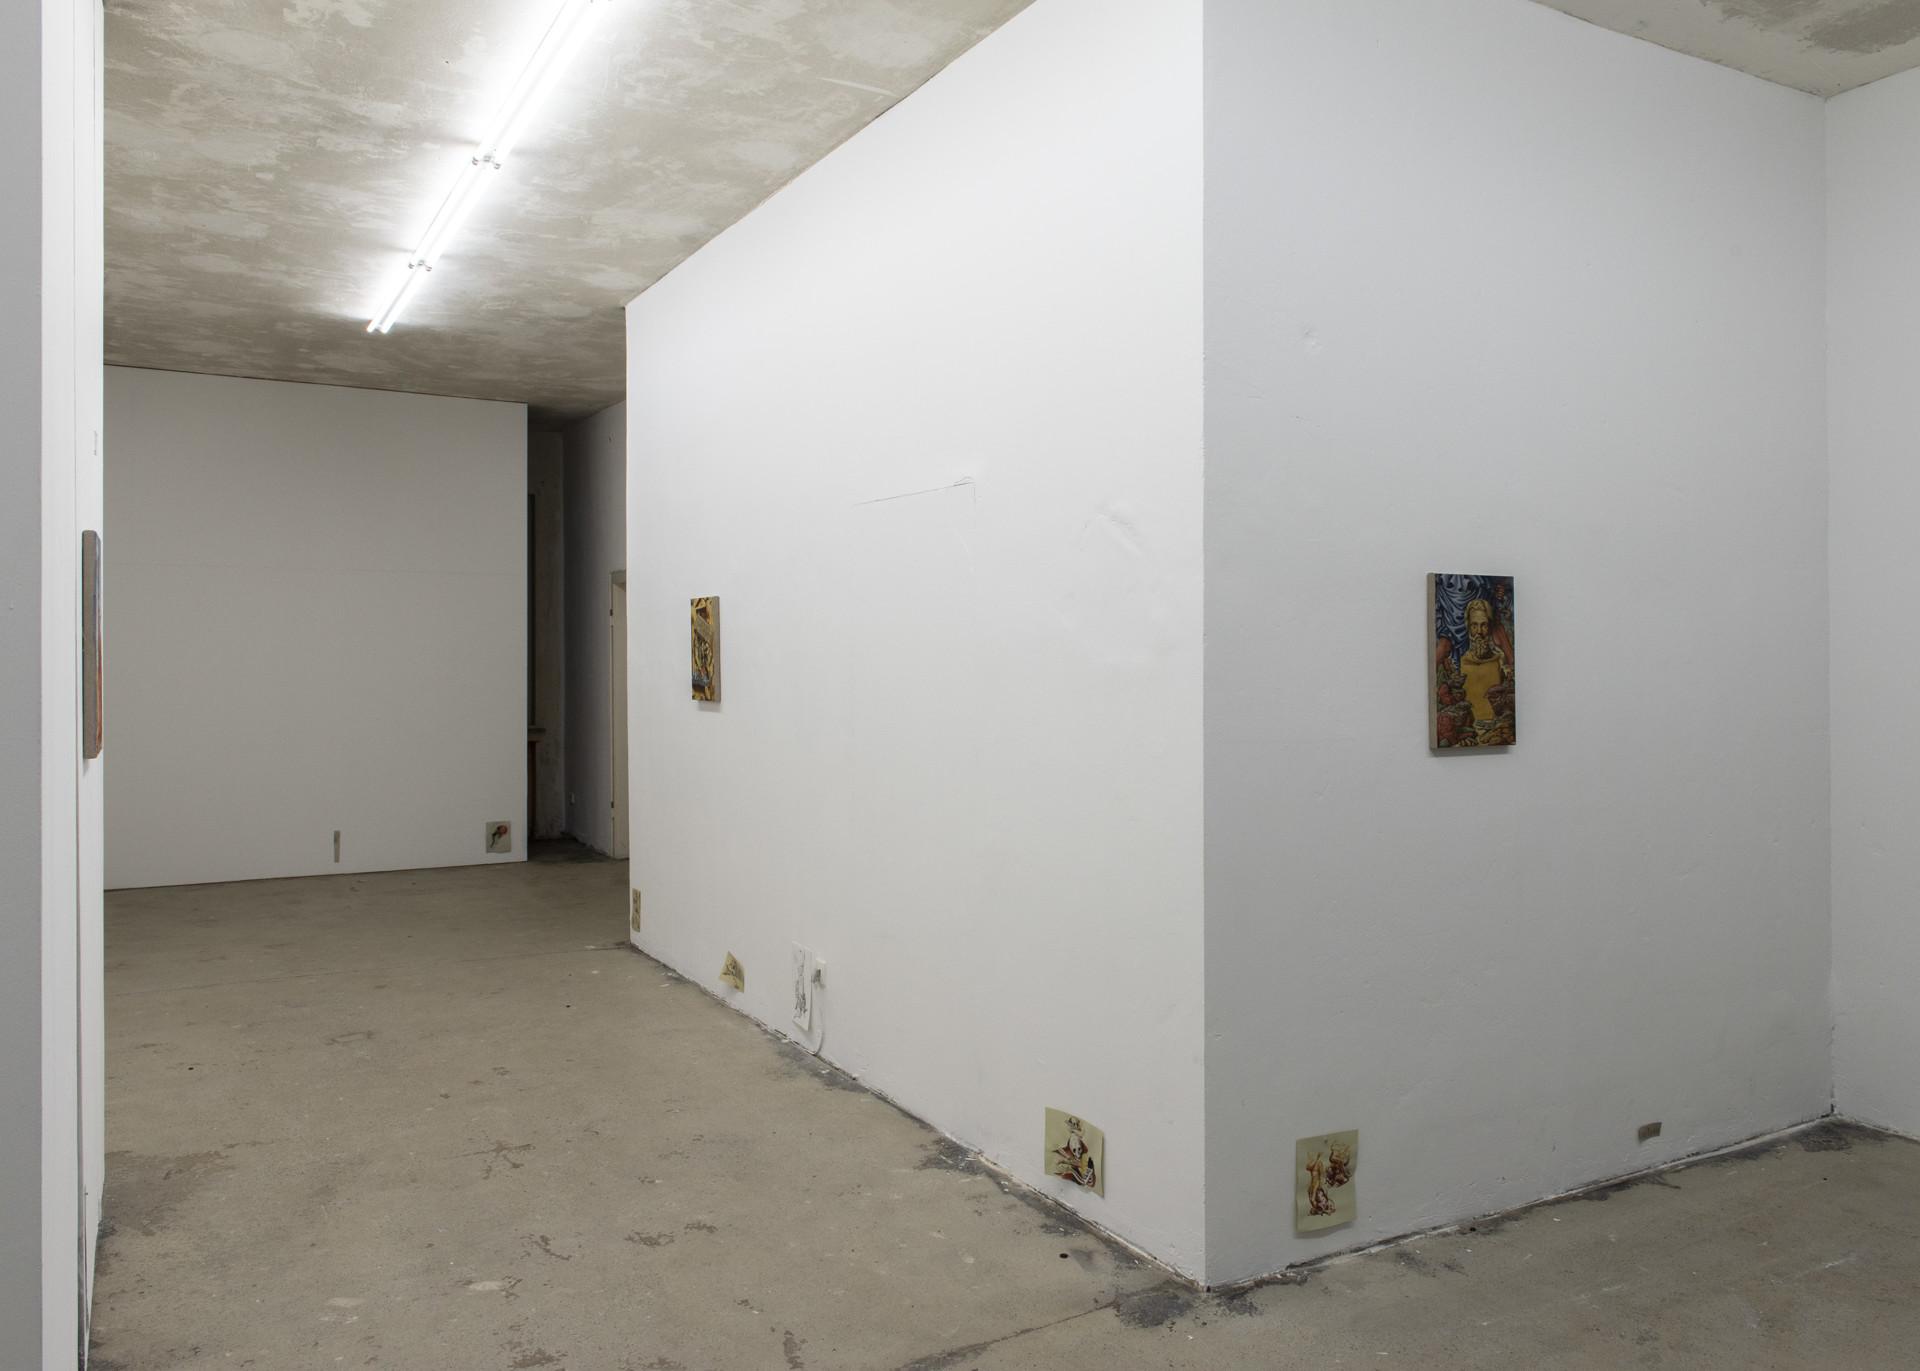 lucashirsch.com Jannis Marwitz – Kündigung